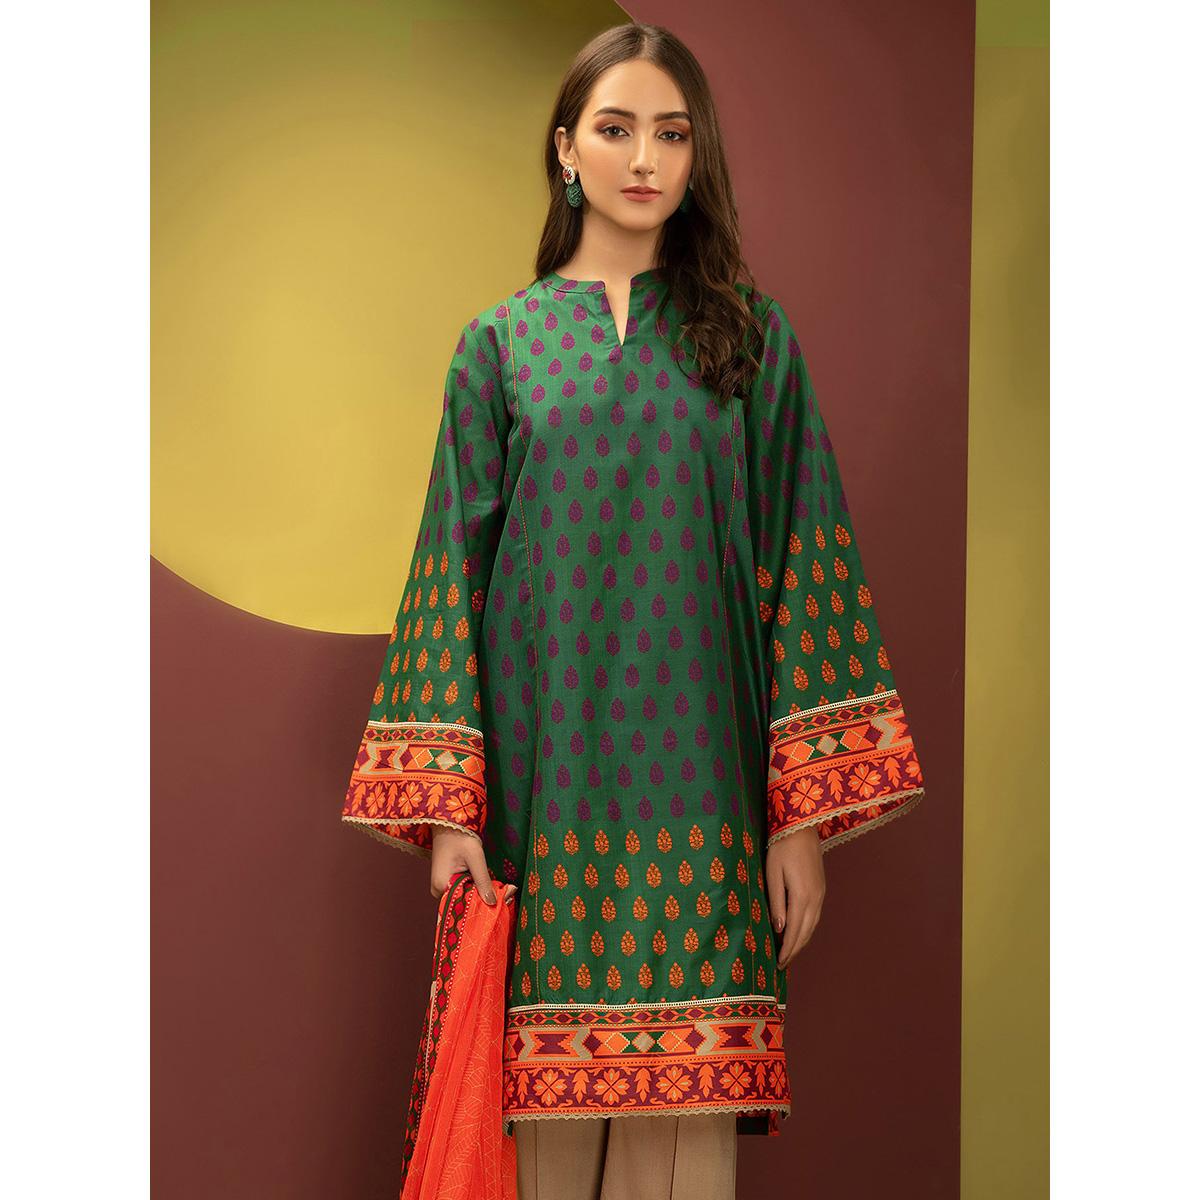 LimeLight Sale 2021 in Pakistan - Daraz Life